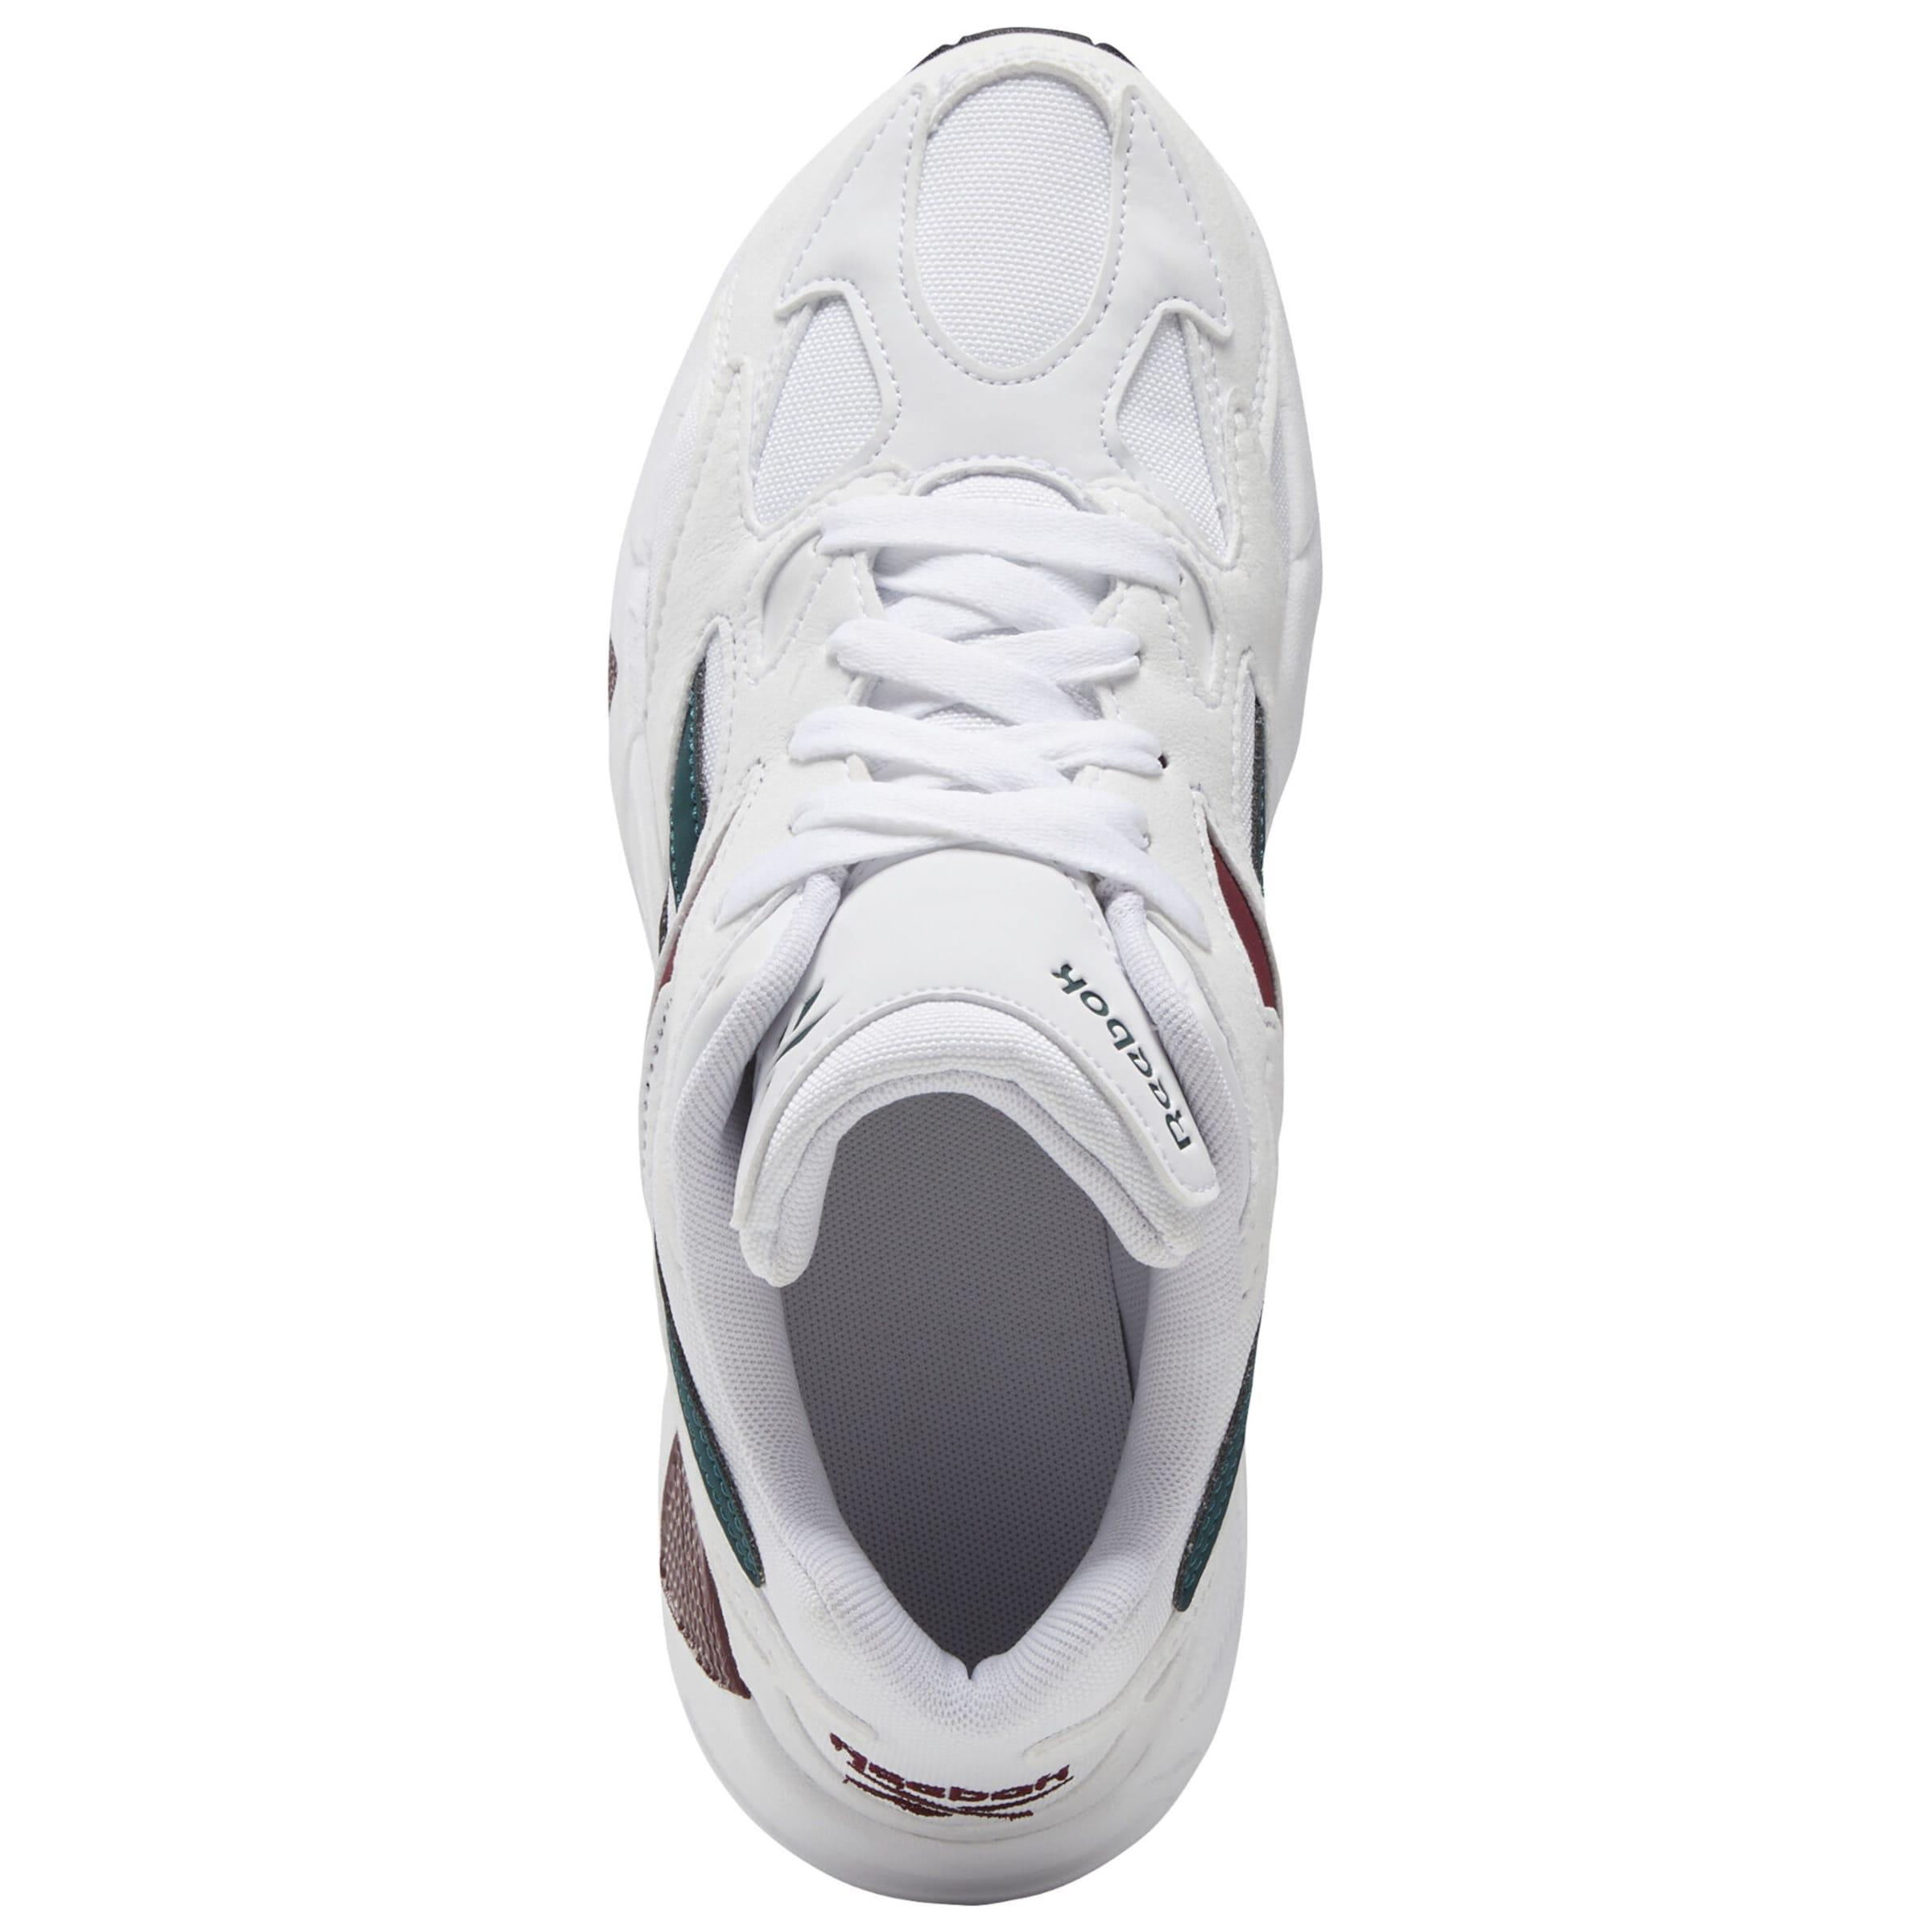 In Weiß Classic Reebok Sneaker Reebok Classic In Weiß Reebok Classic Sneaker Sneaker fgY7b6yv